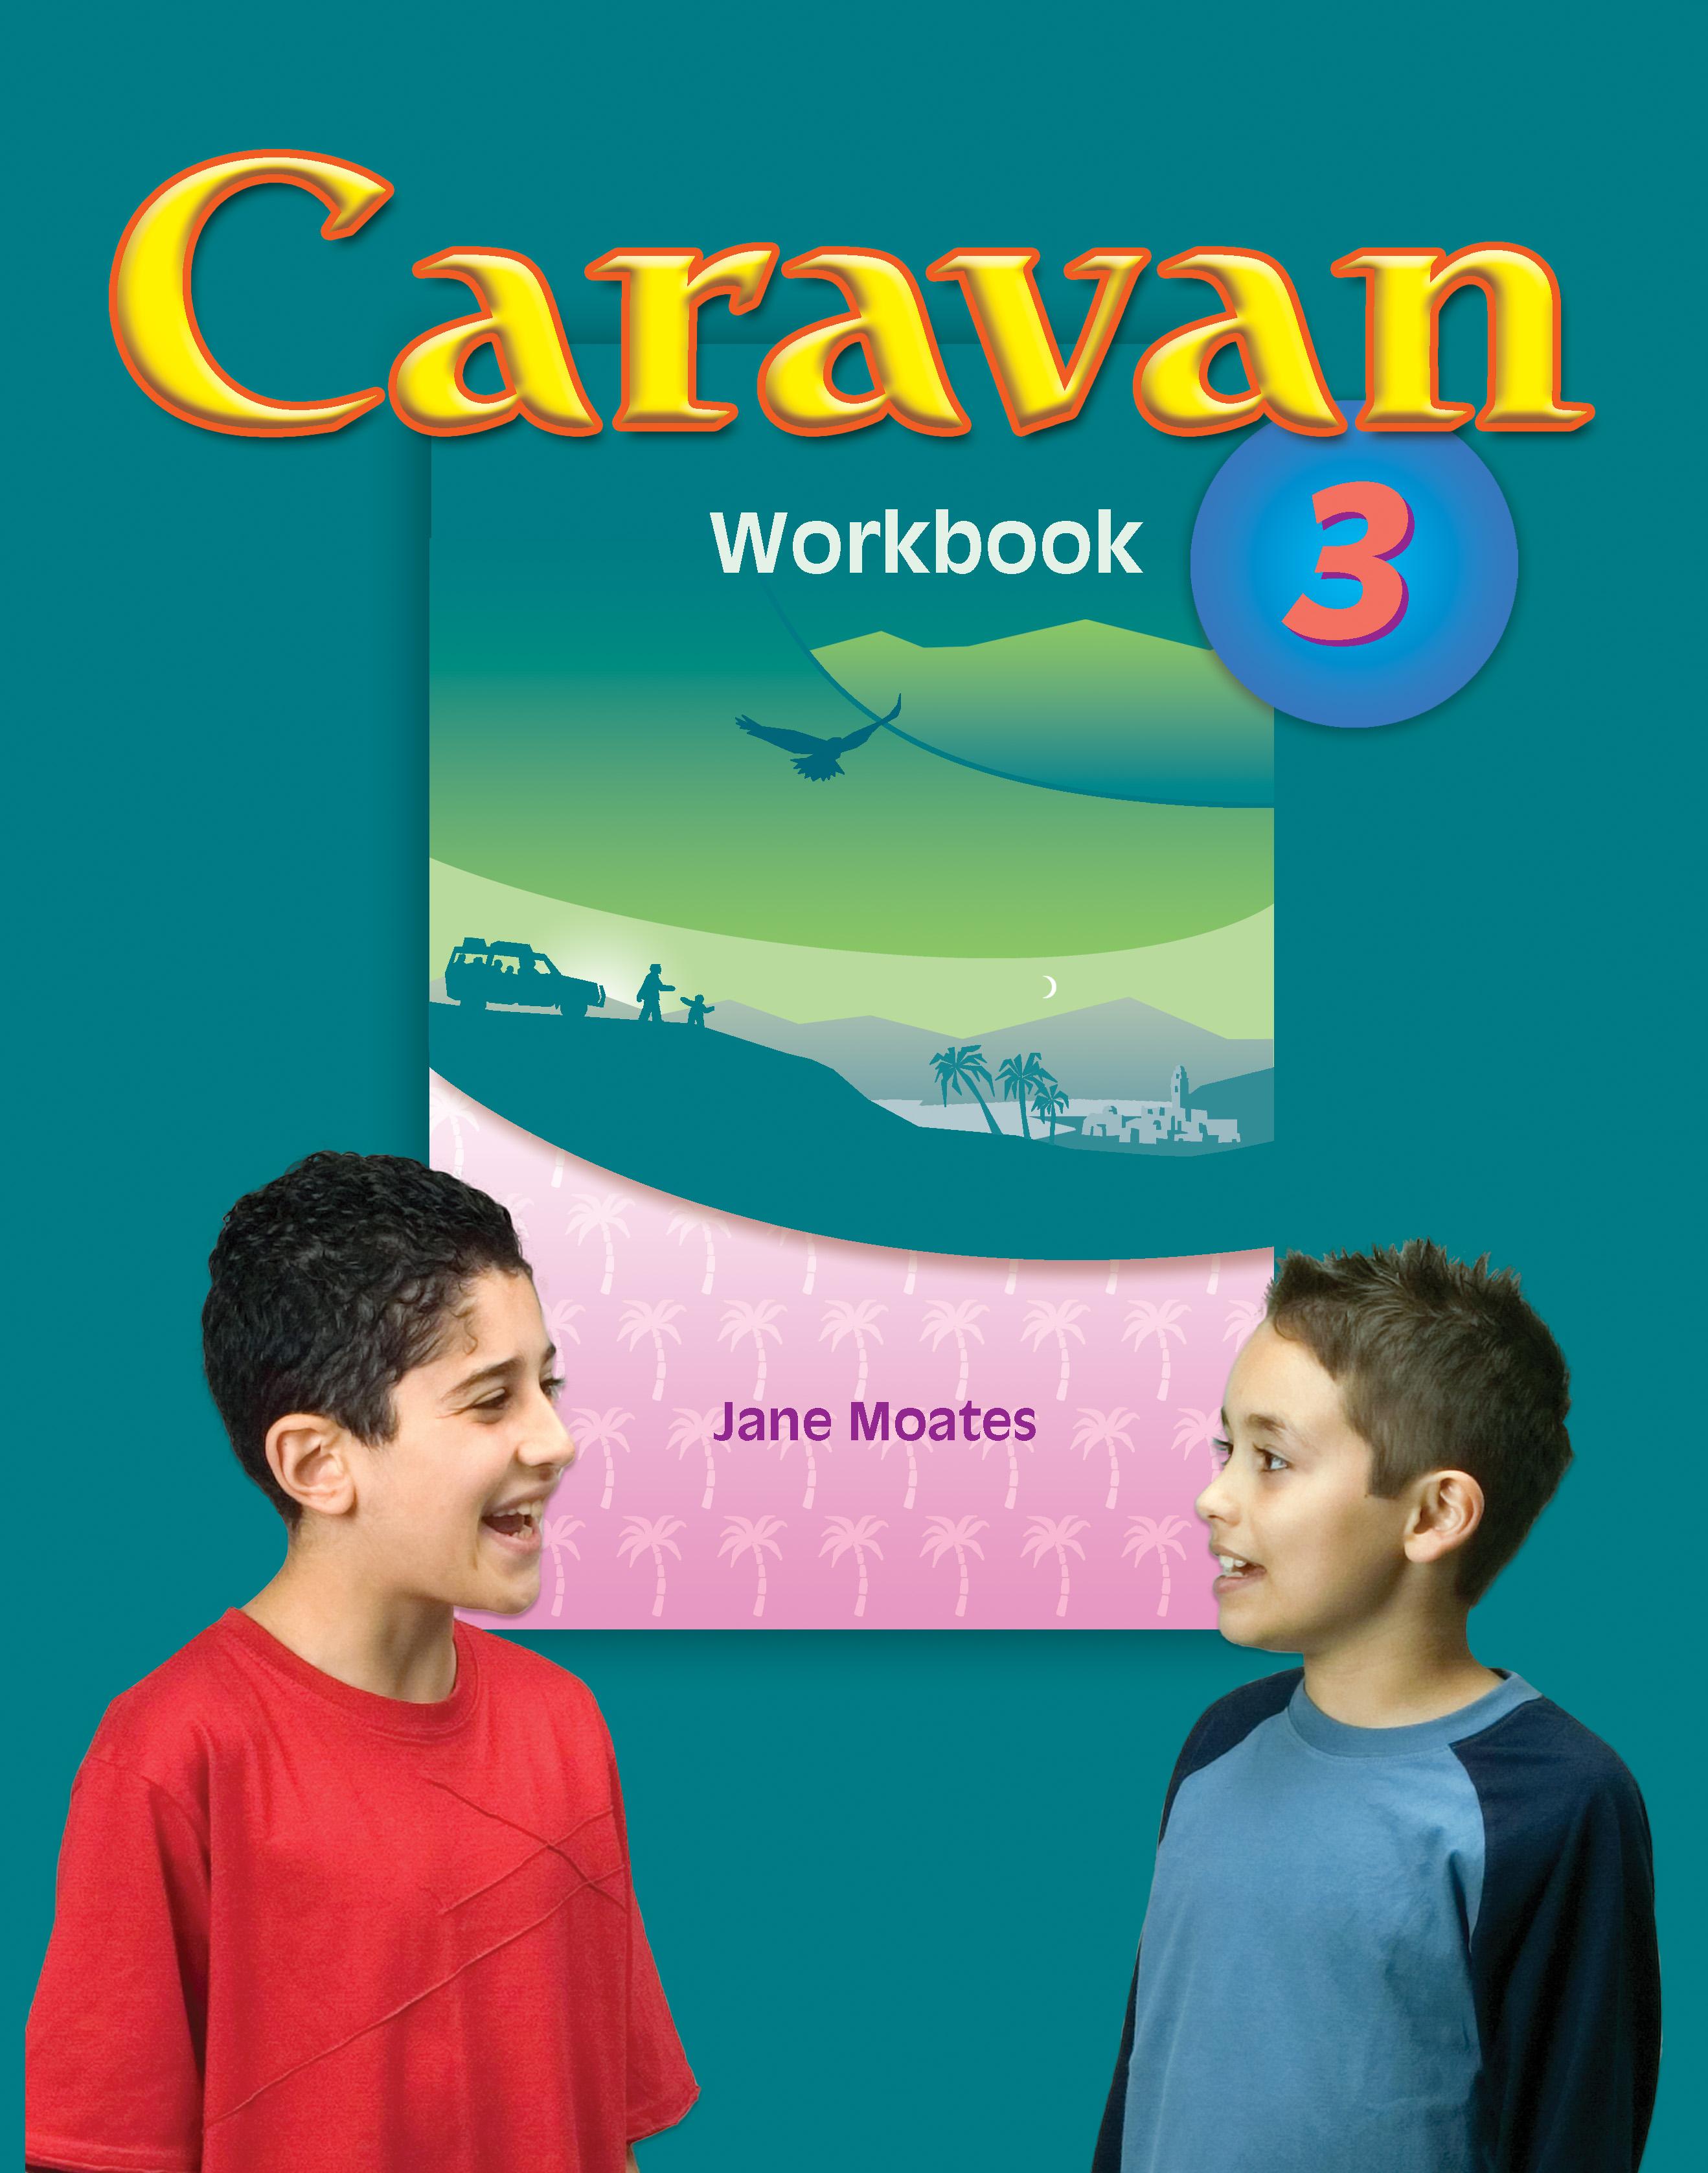 Caravan 3 Workbook